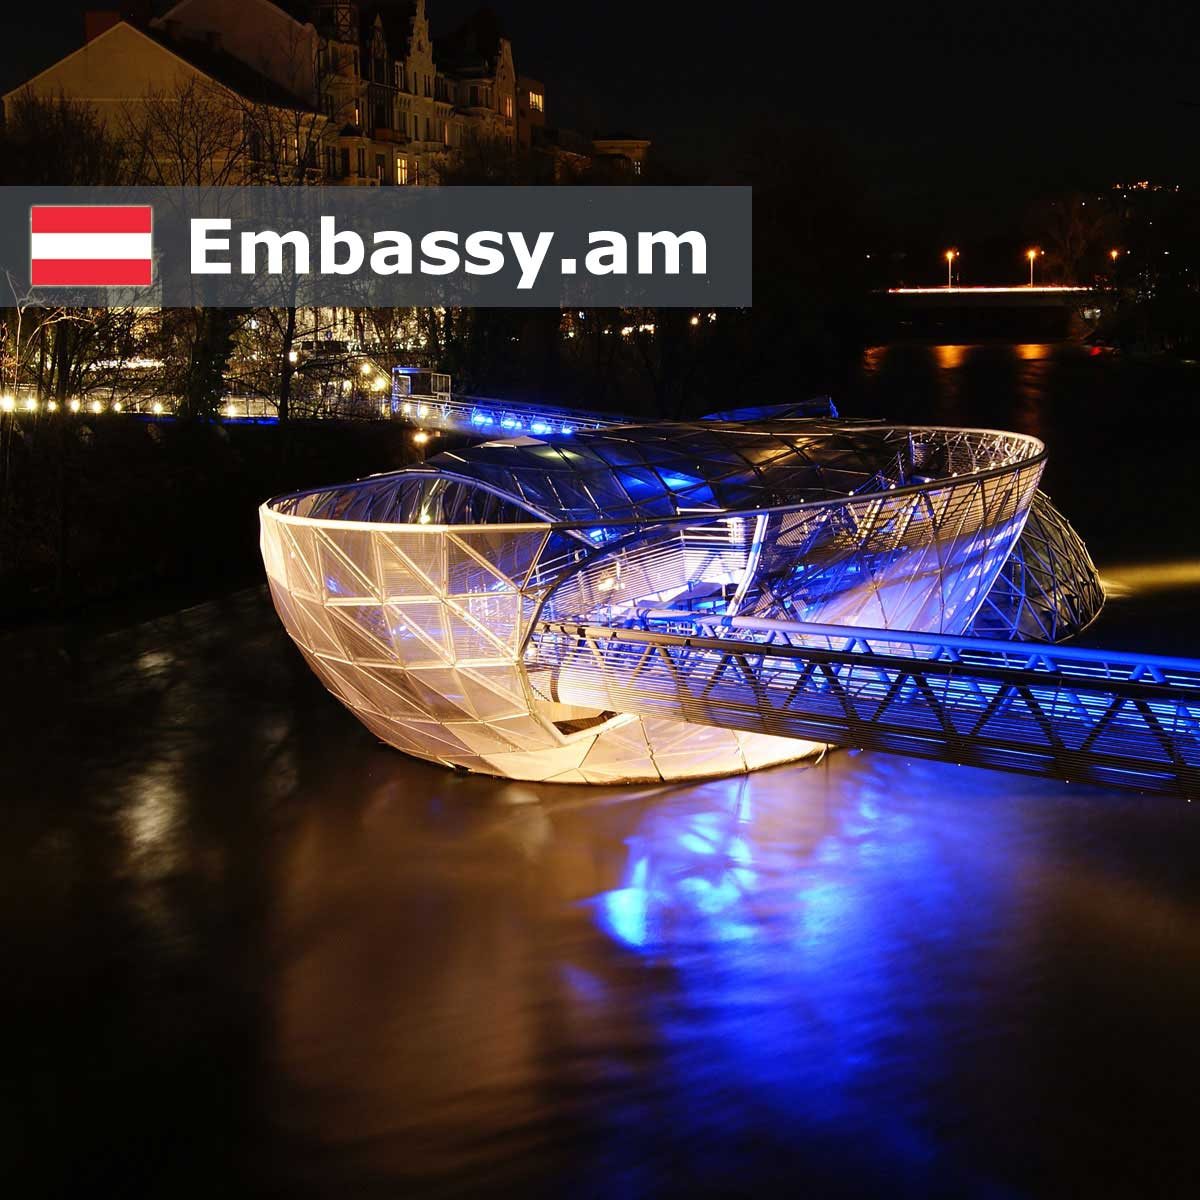 Грац - Отели в Австрии - Embassy.am